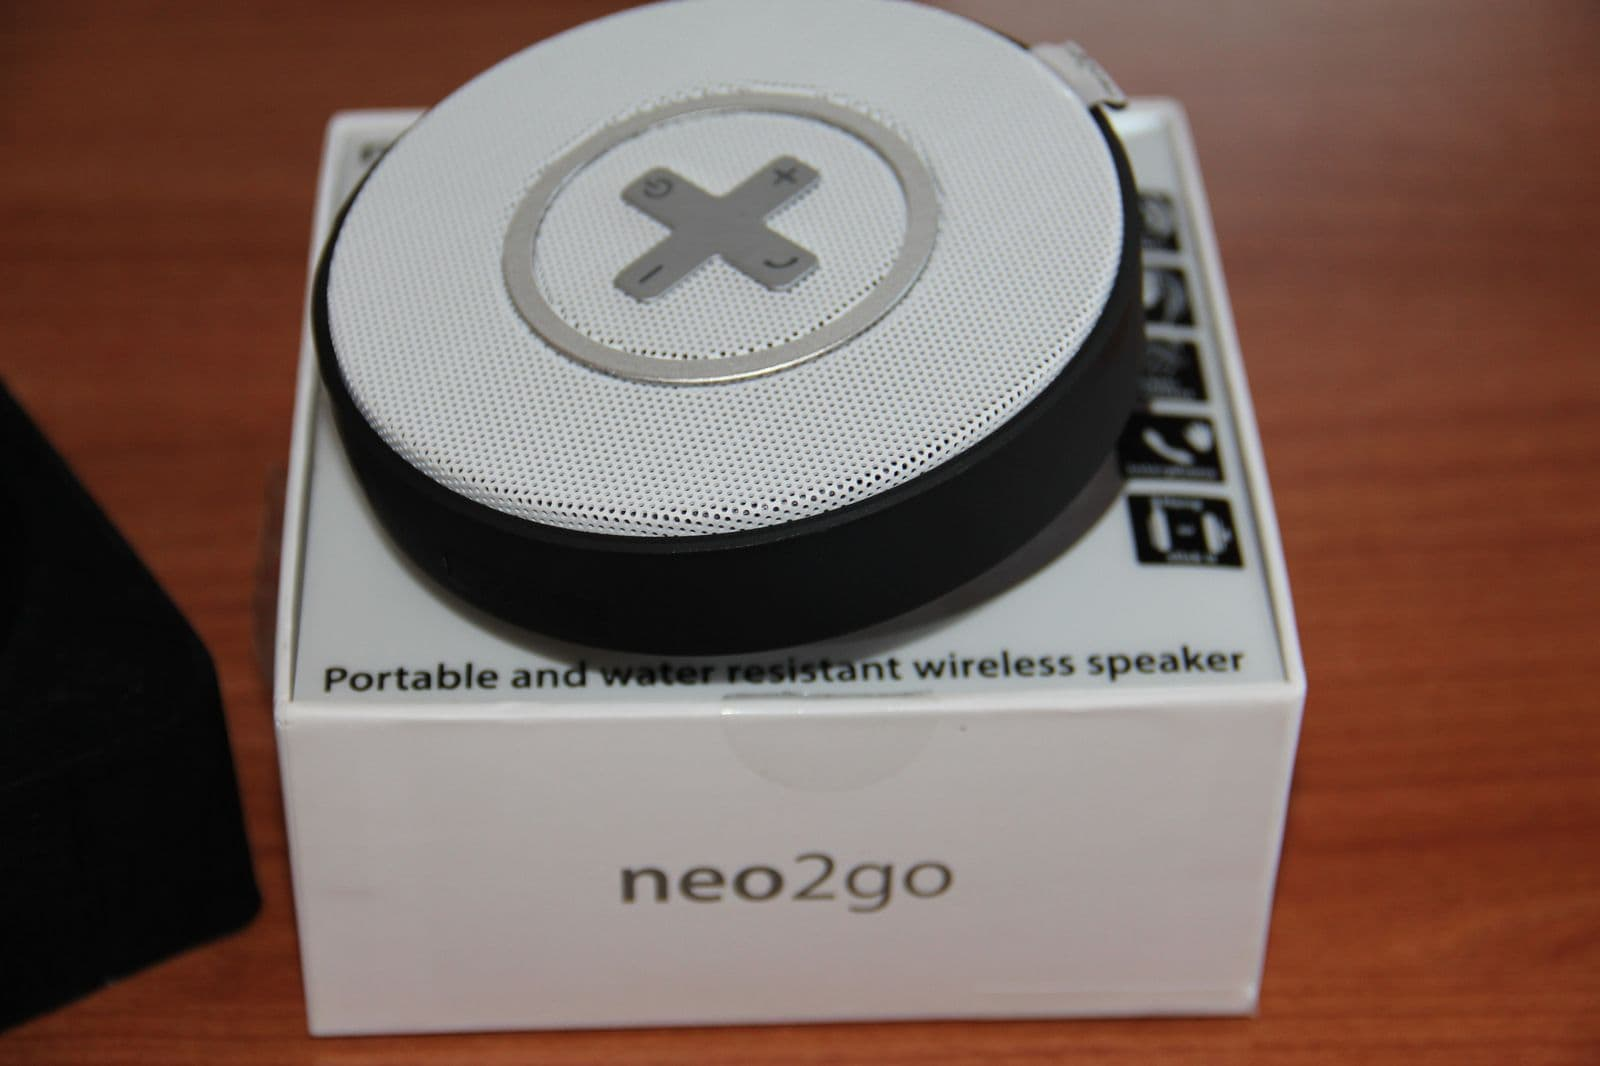 HDigit neo2go (7)